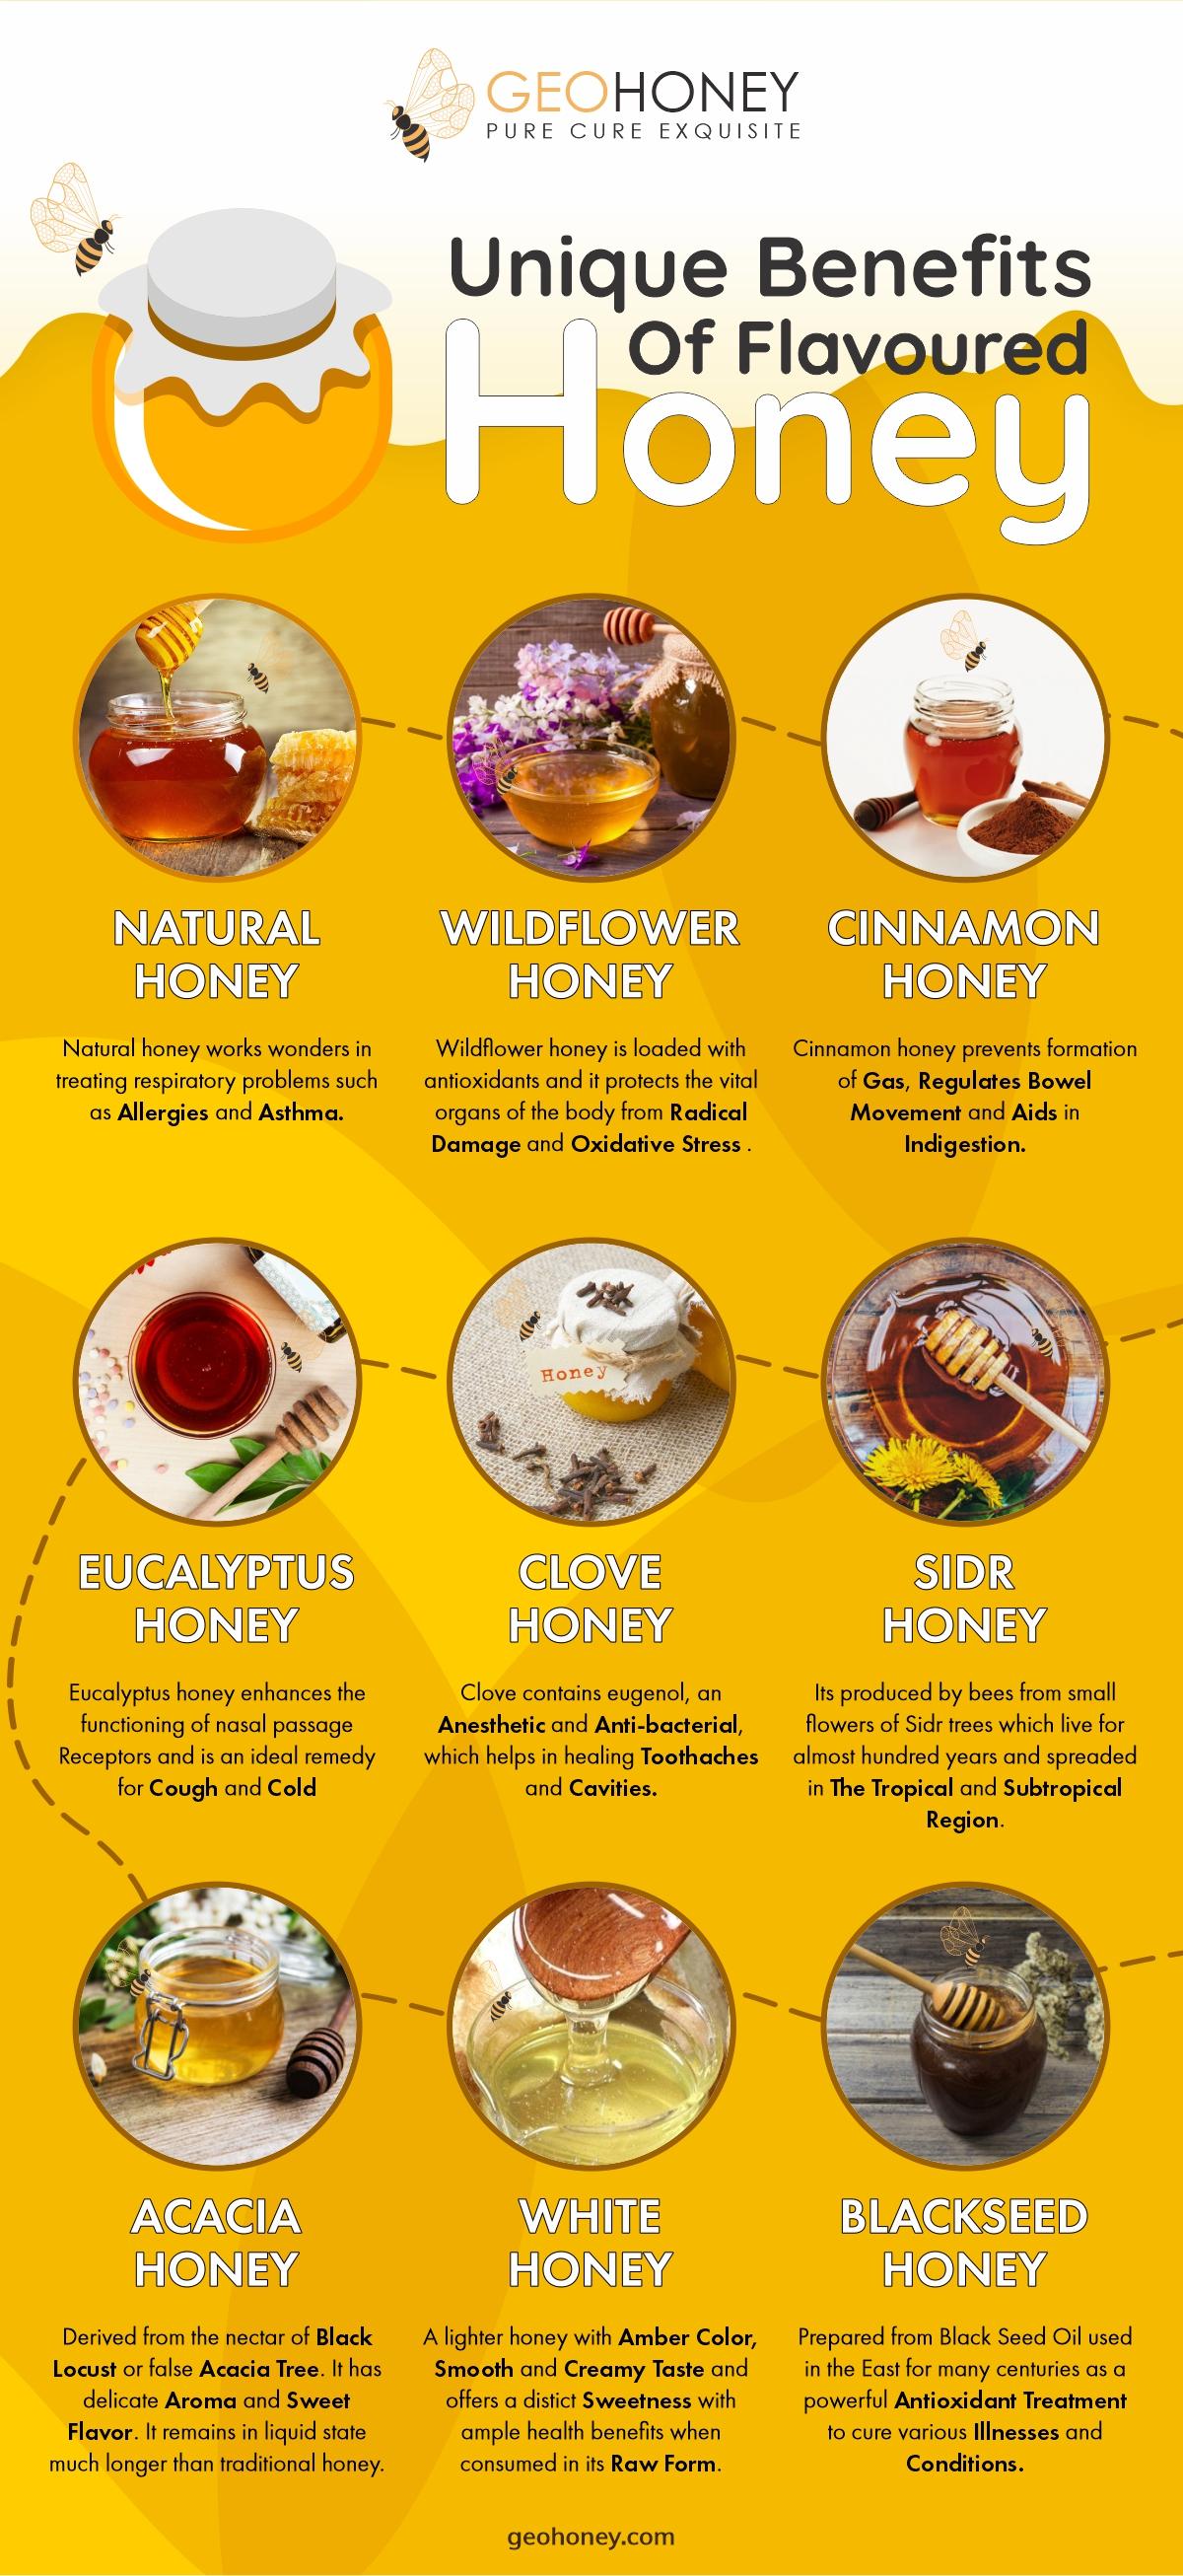 Flavoured Honey - Geohoney